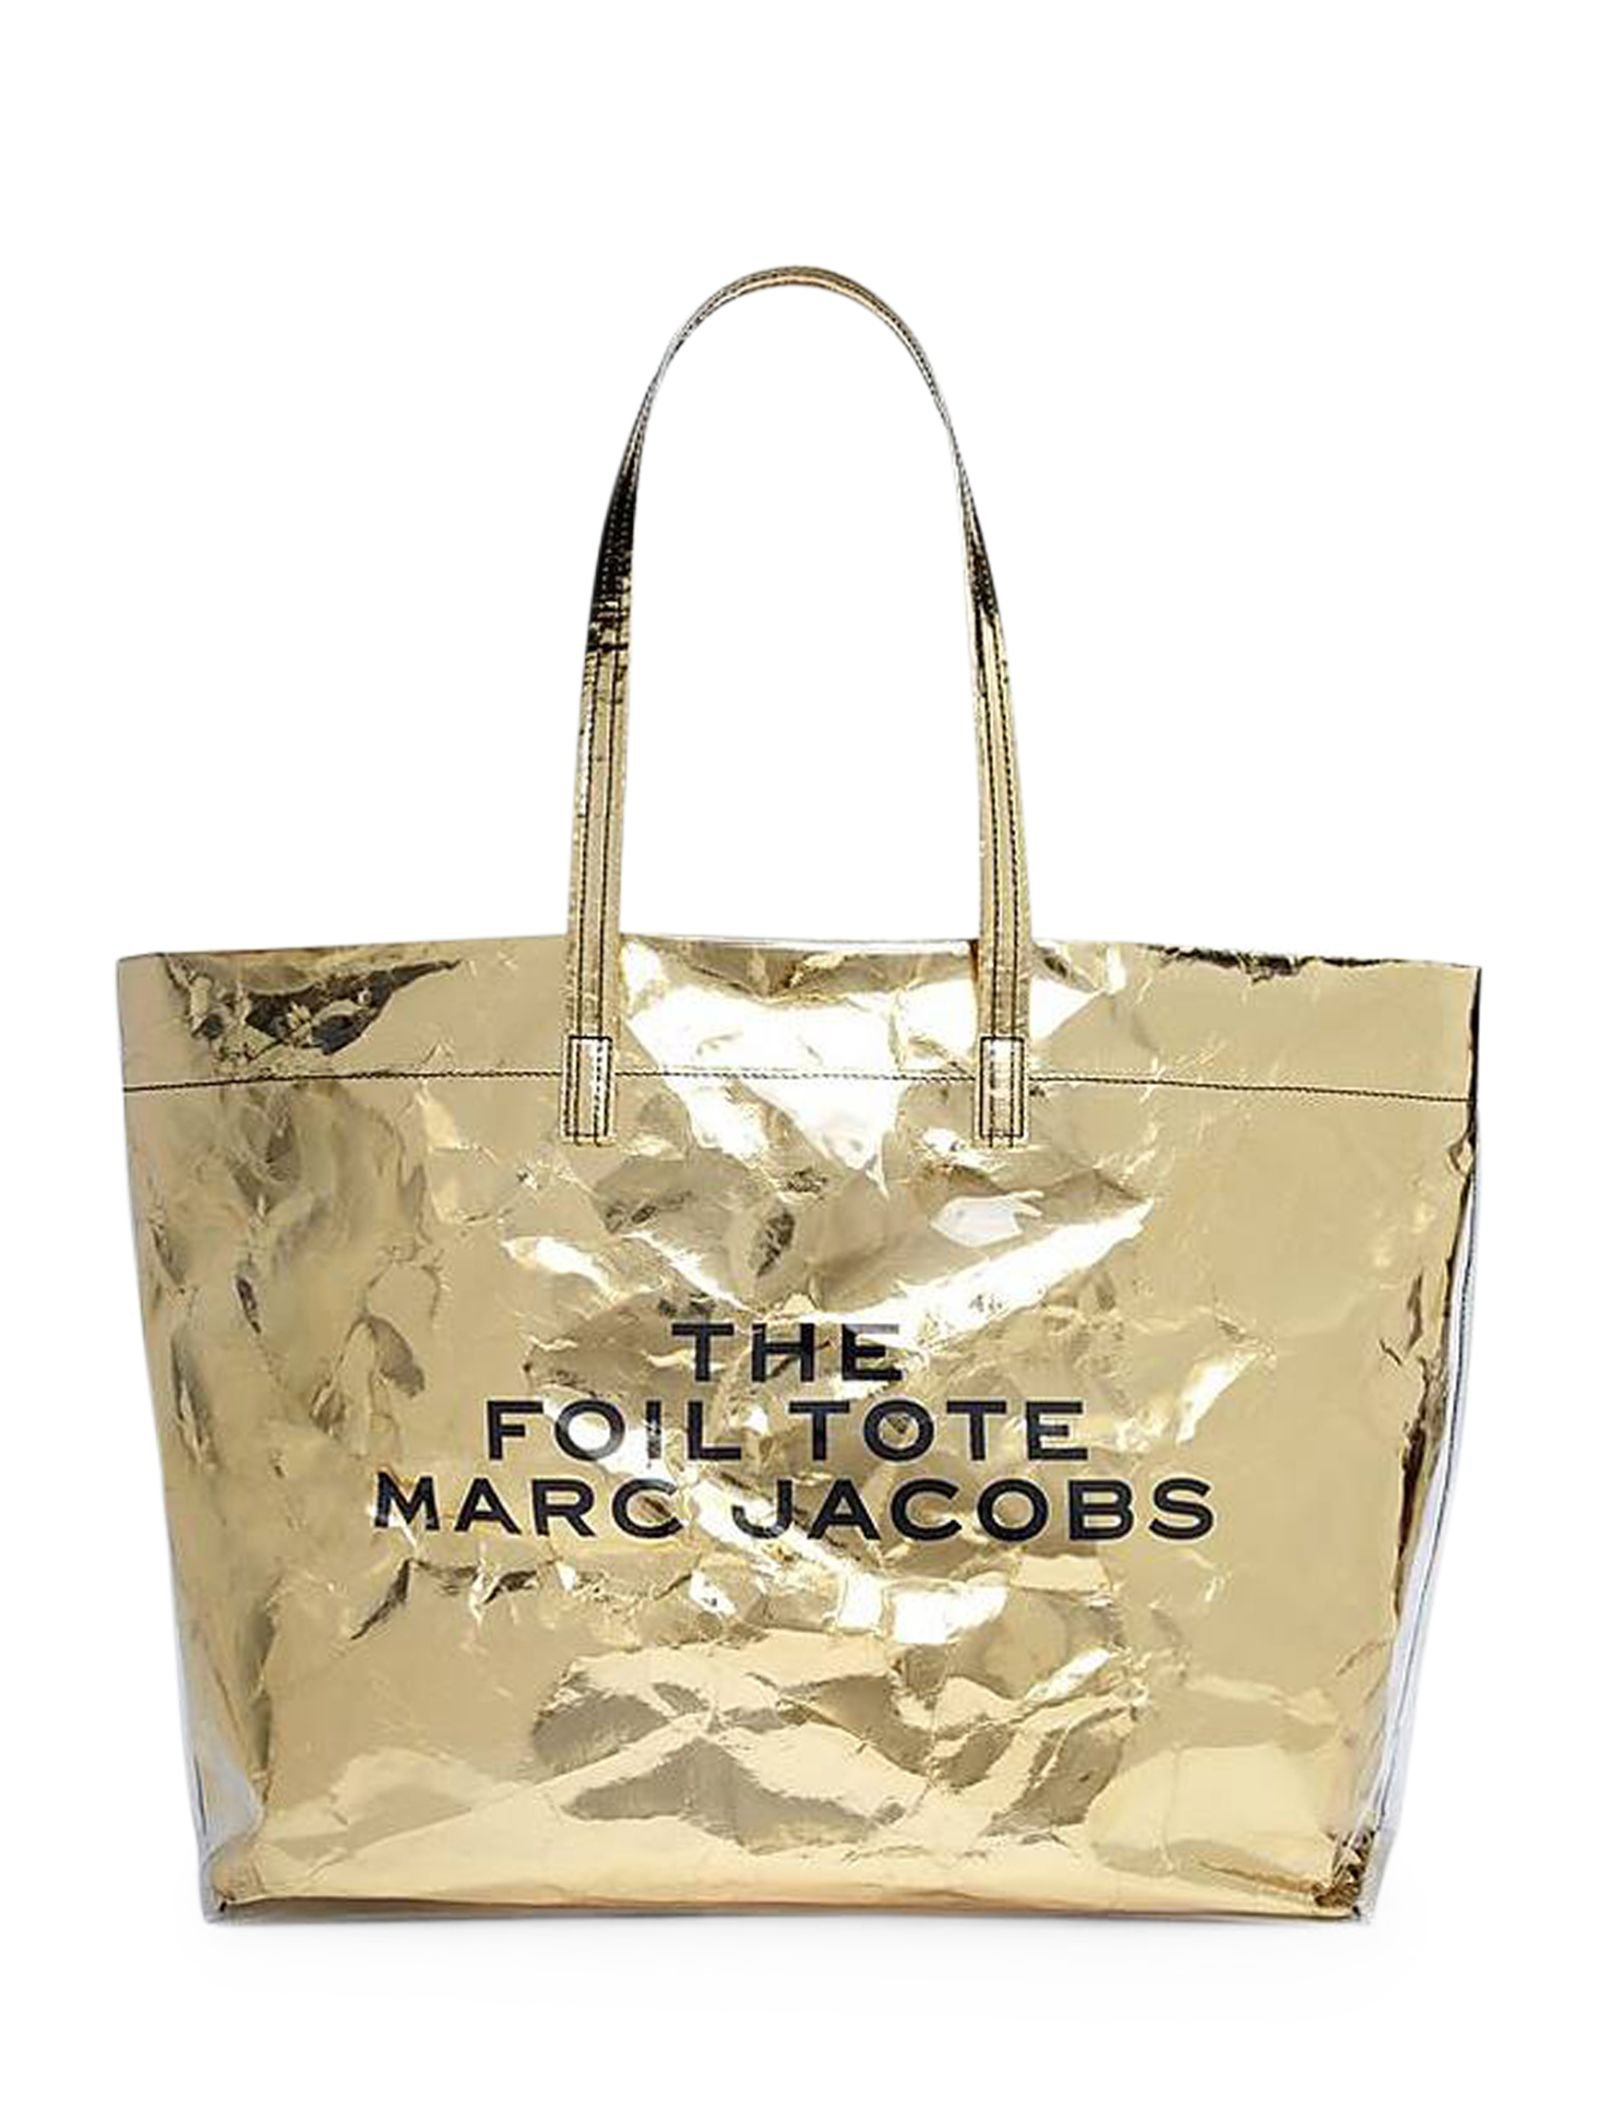 Marc Jacobs Gold Foil Tote